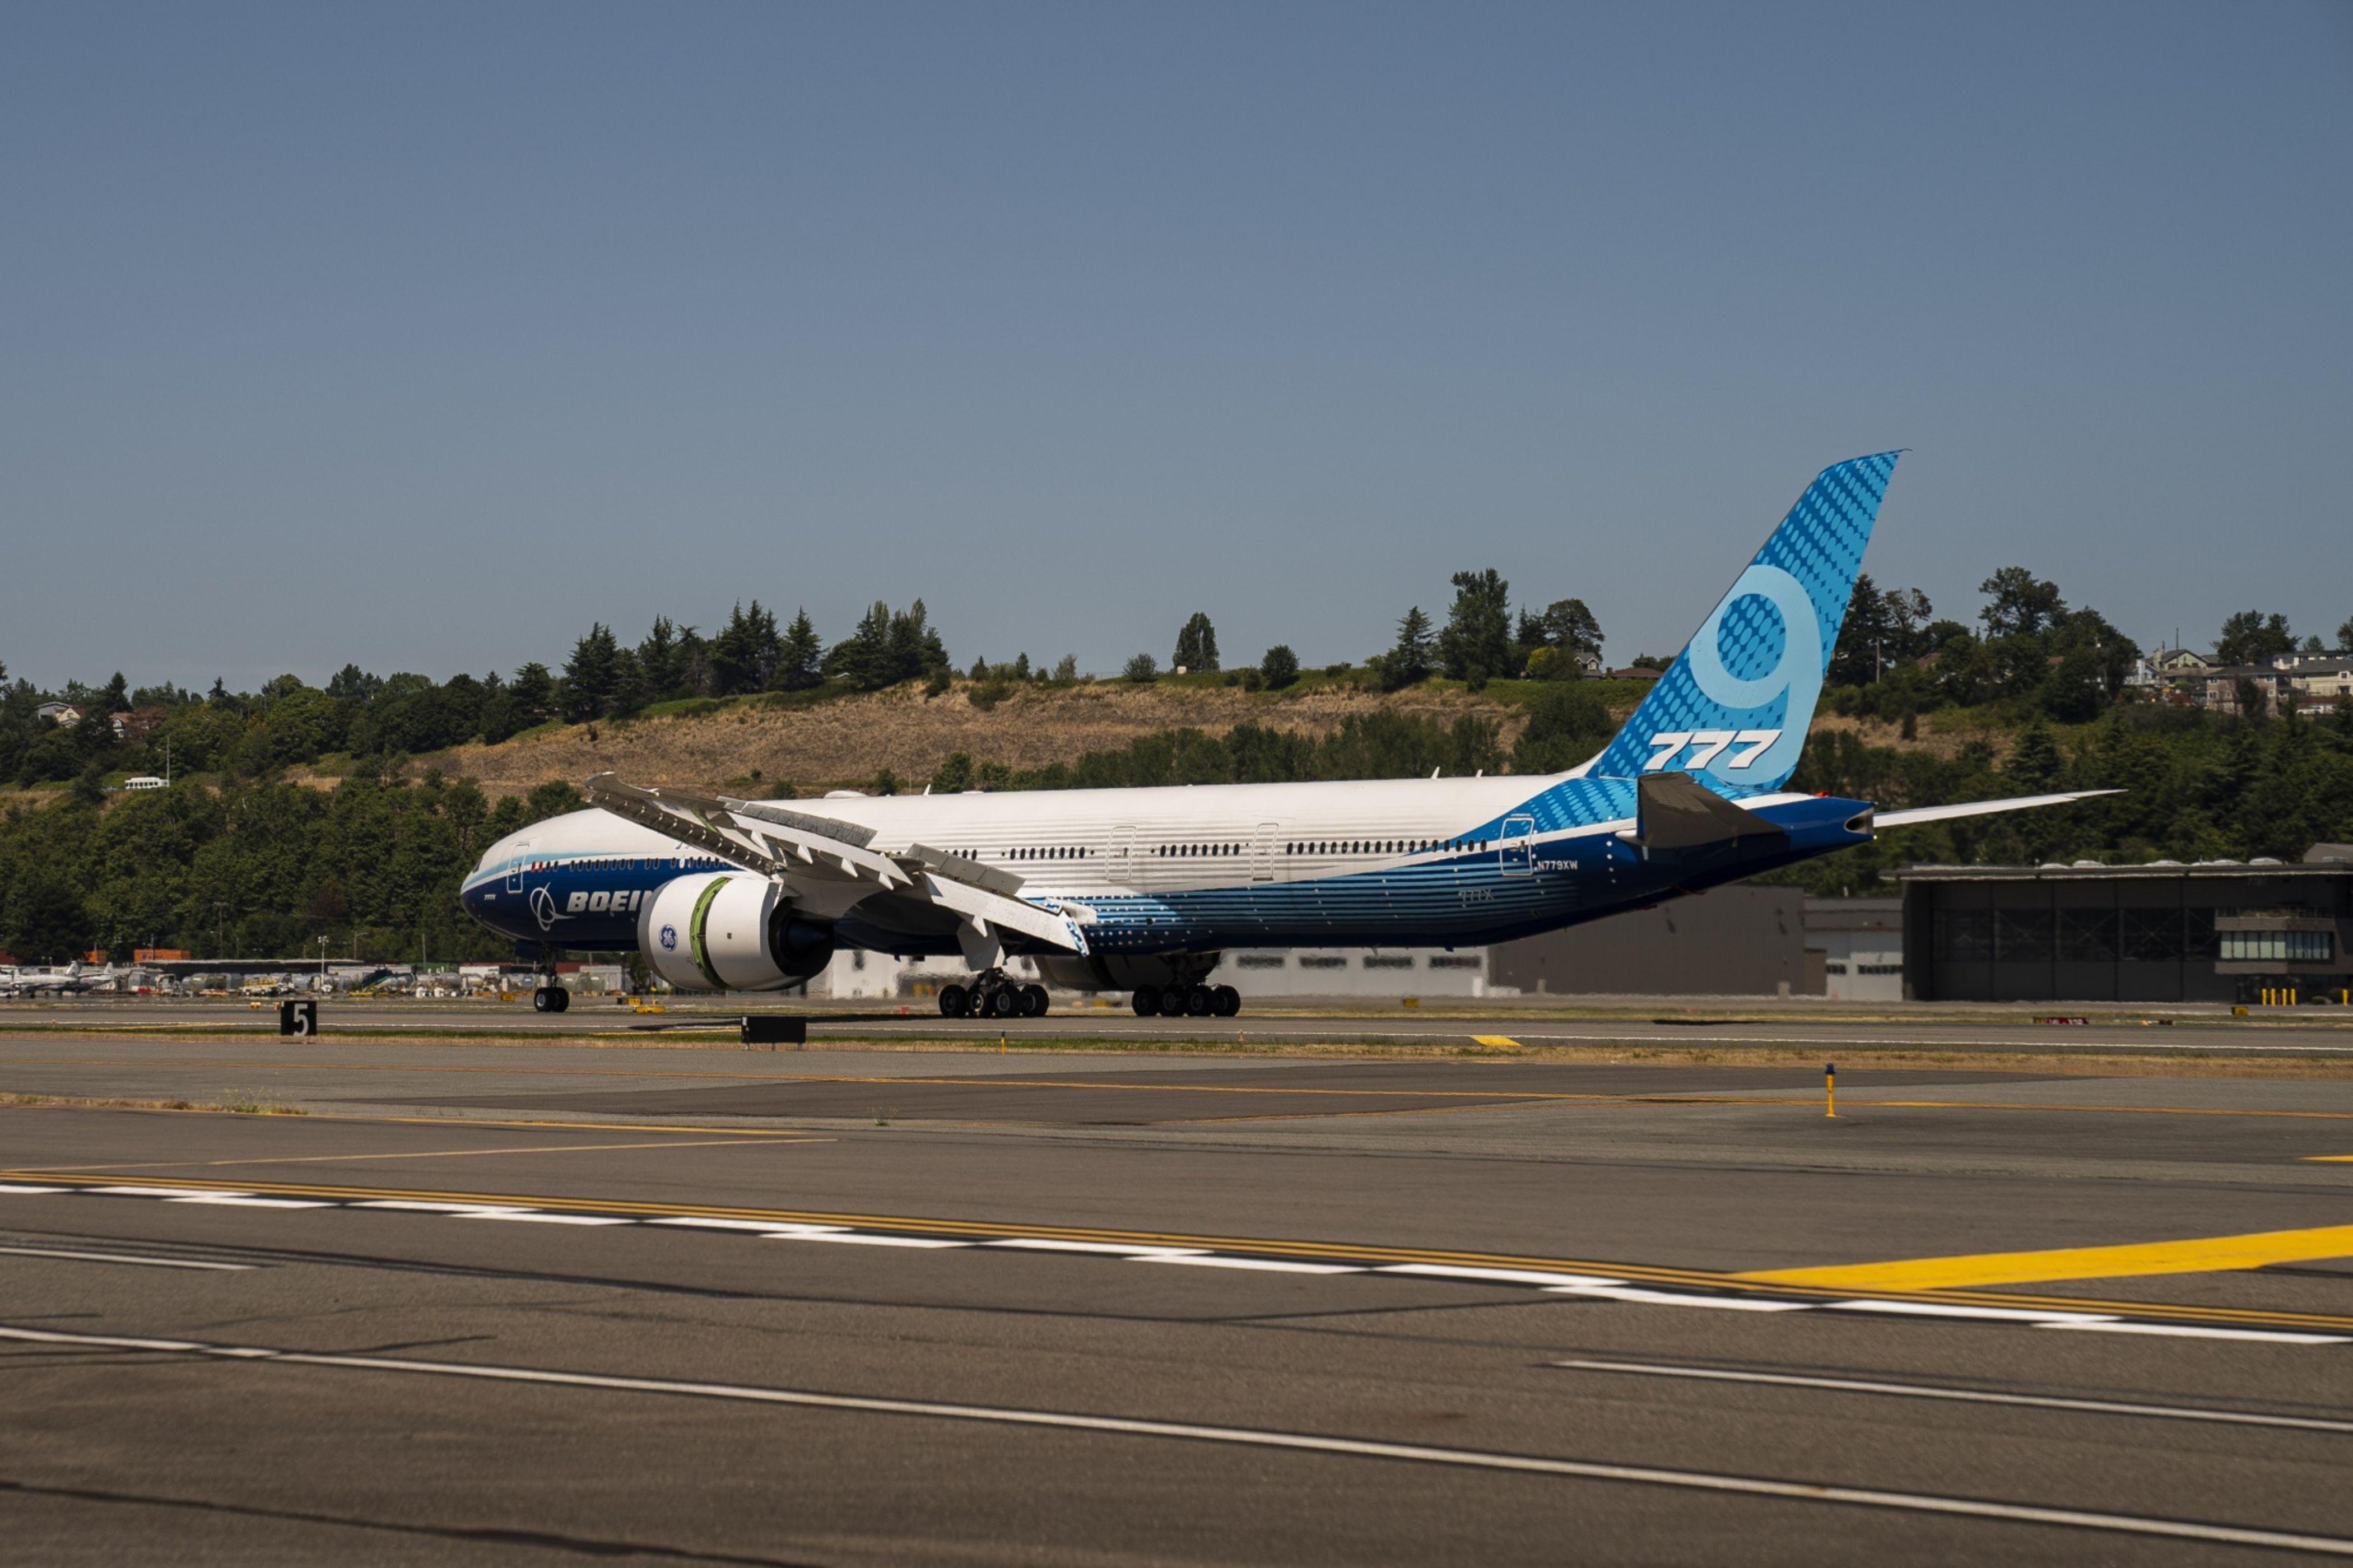 European Union and British regulators clear Boeing 737 Max for flights